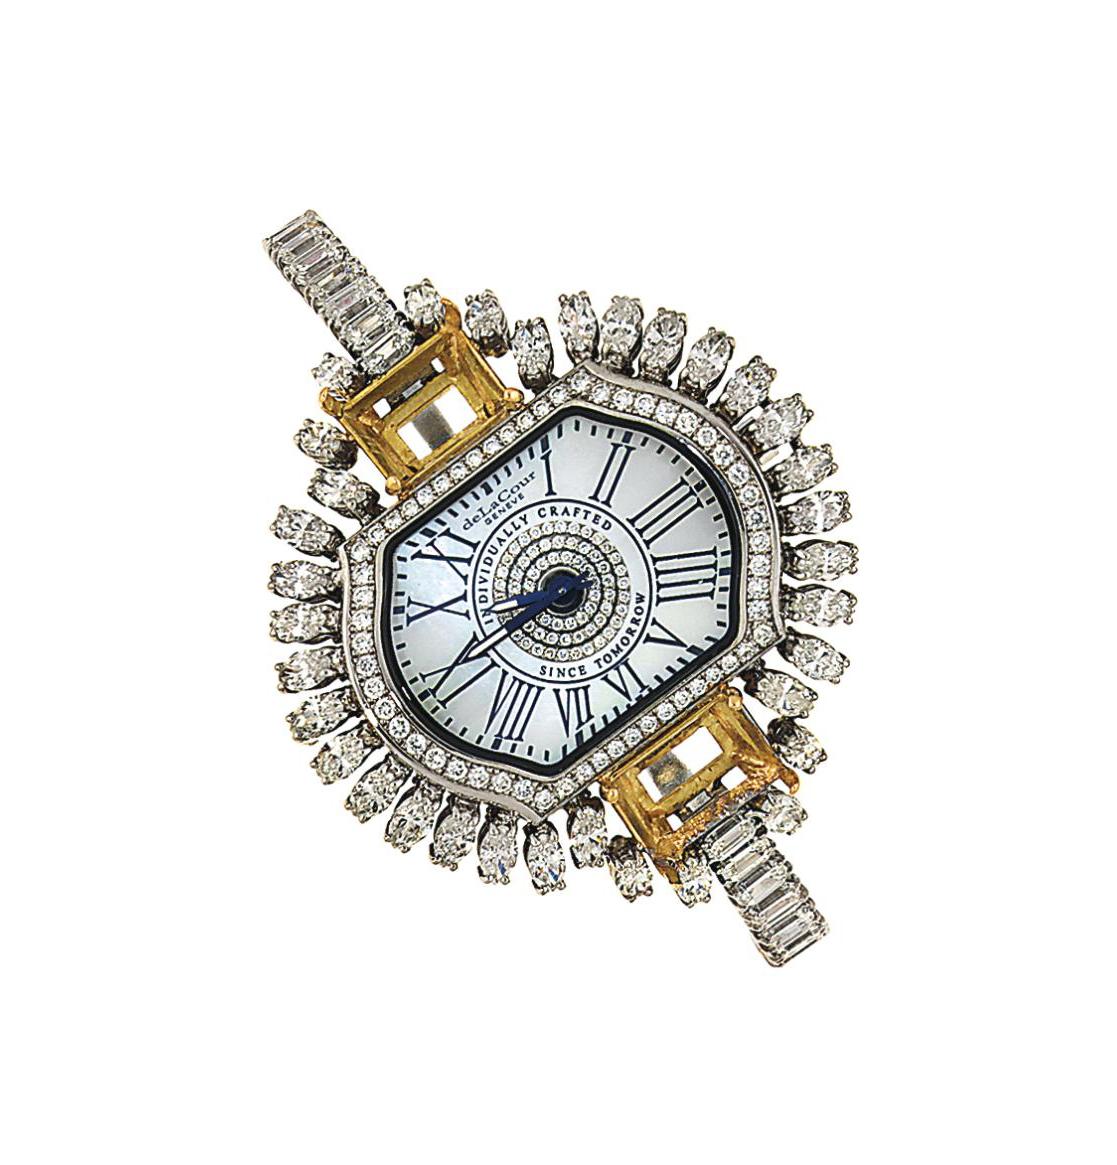 An 18ct white gold diamond-set